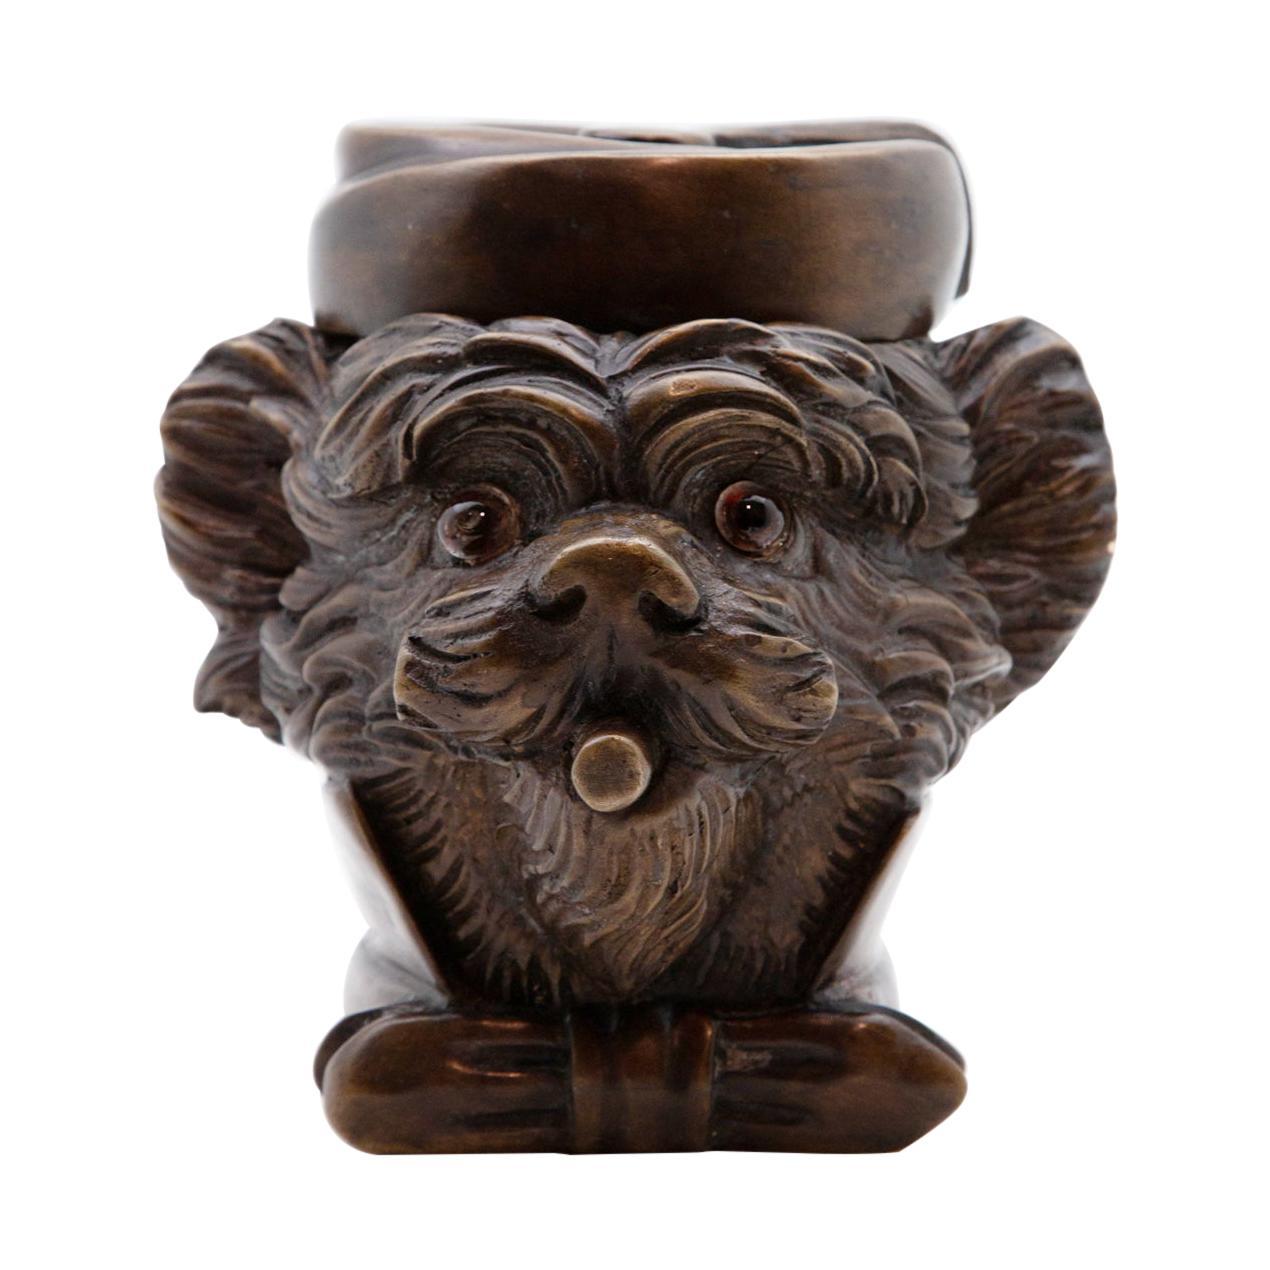 19th Century French Yorkie Tobacco Jar